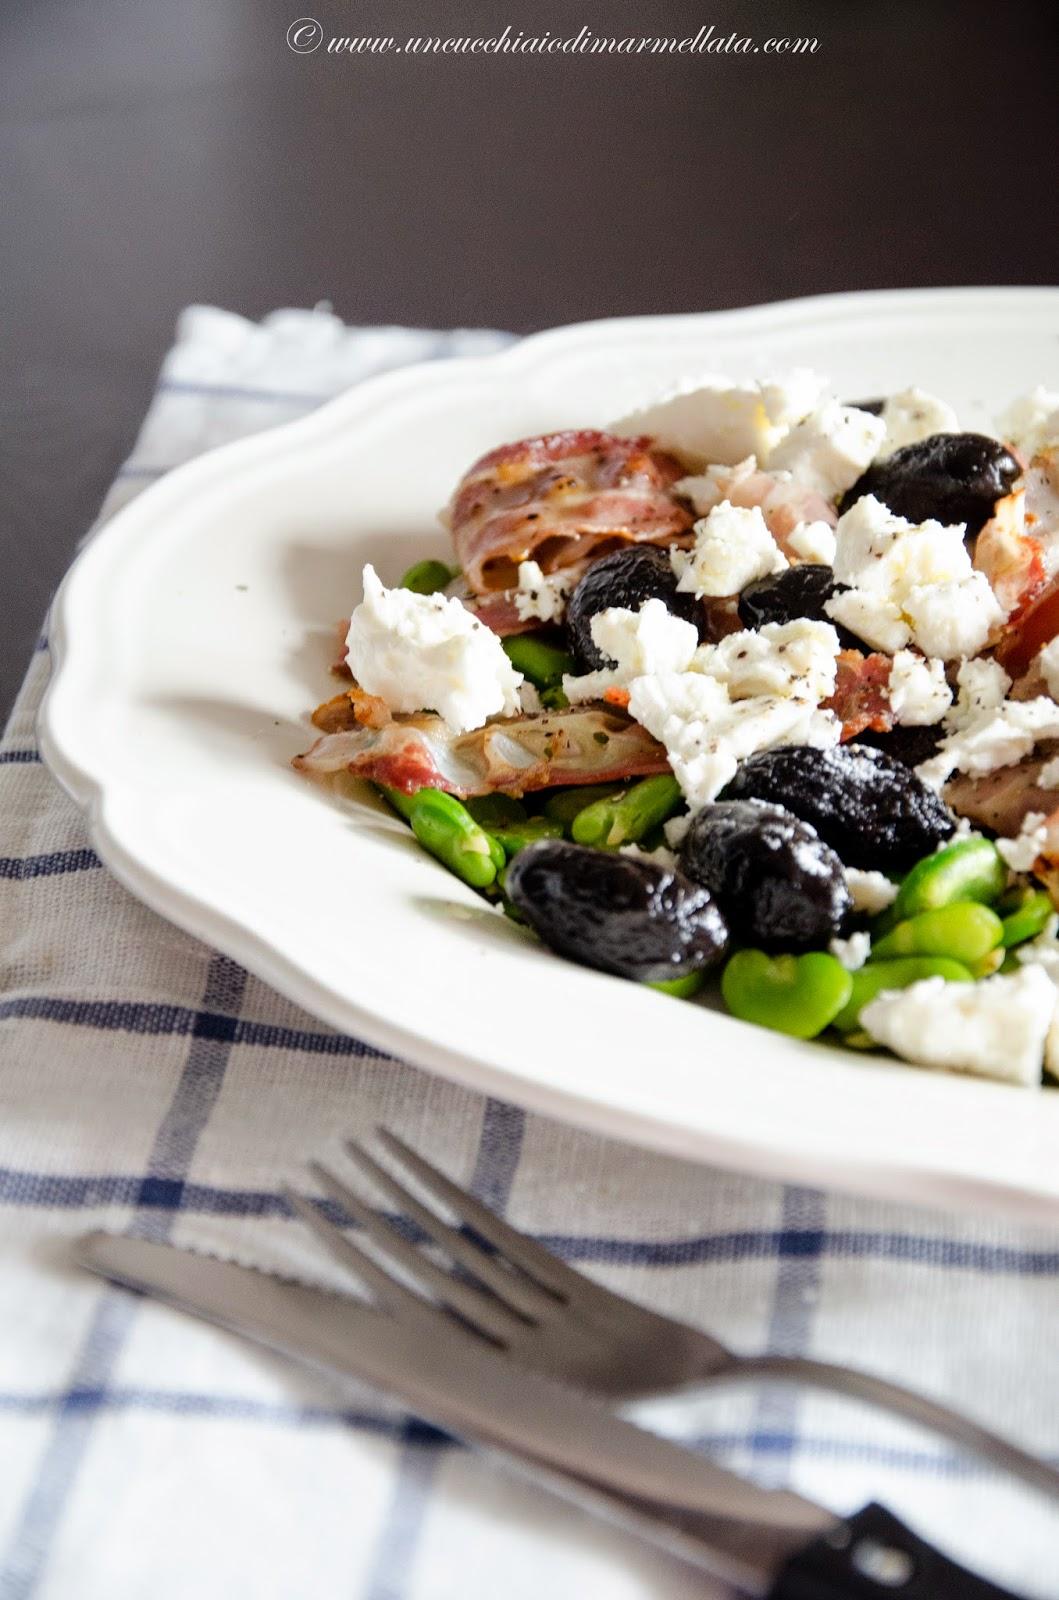 insalata mediterranea di fave